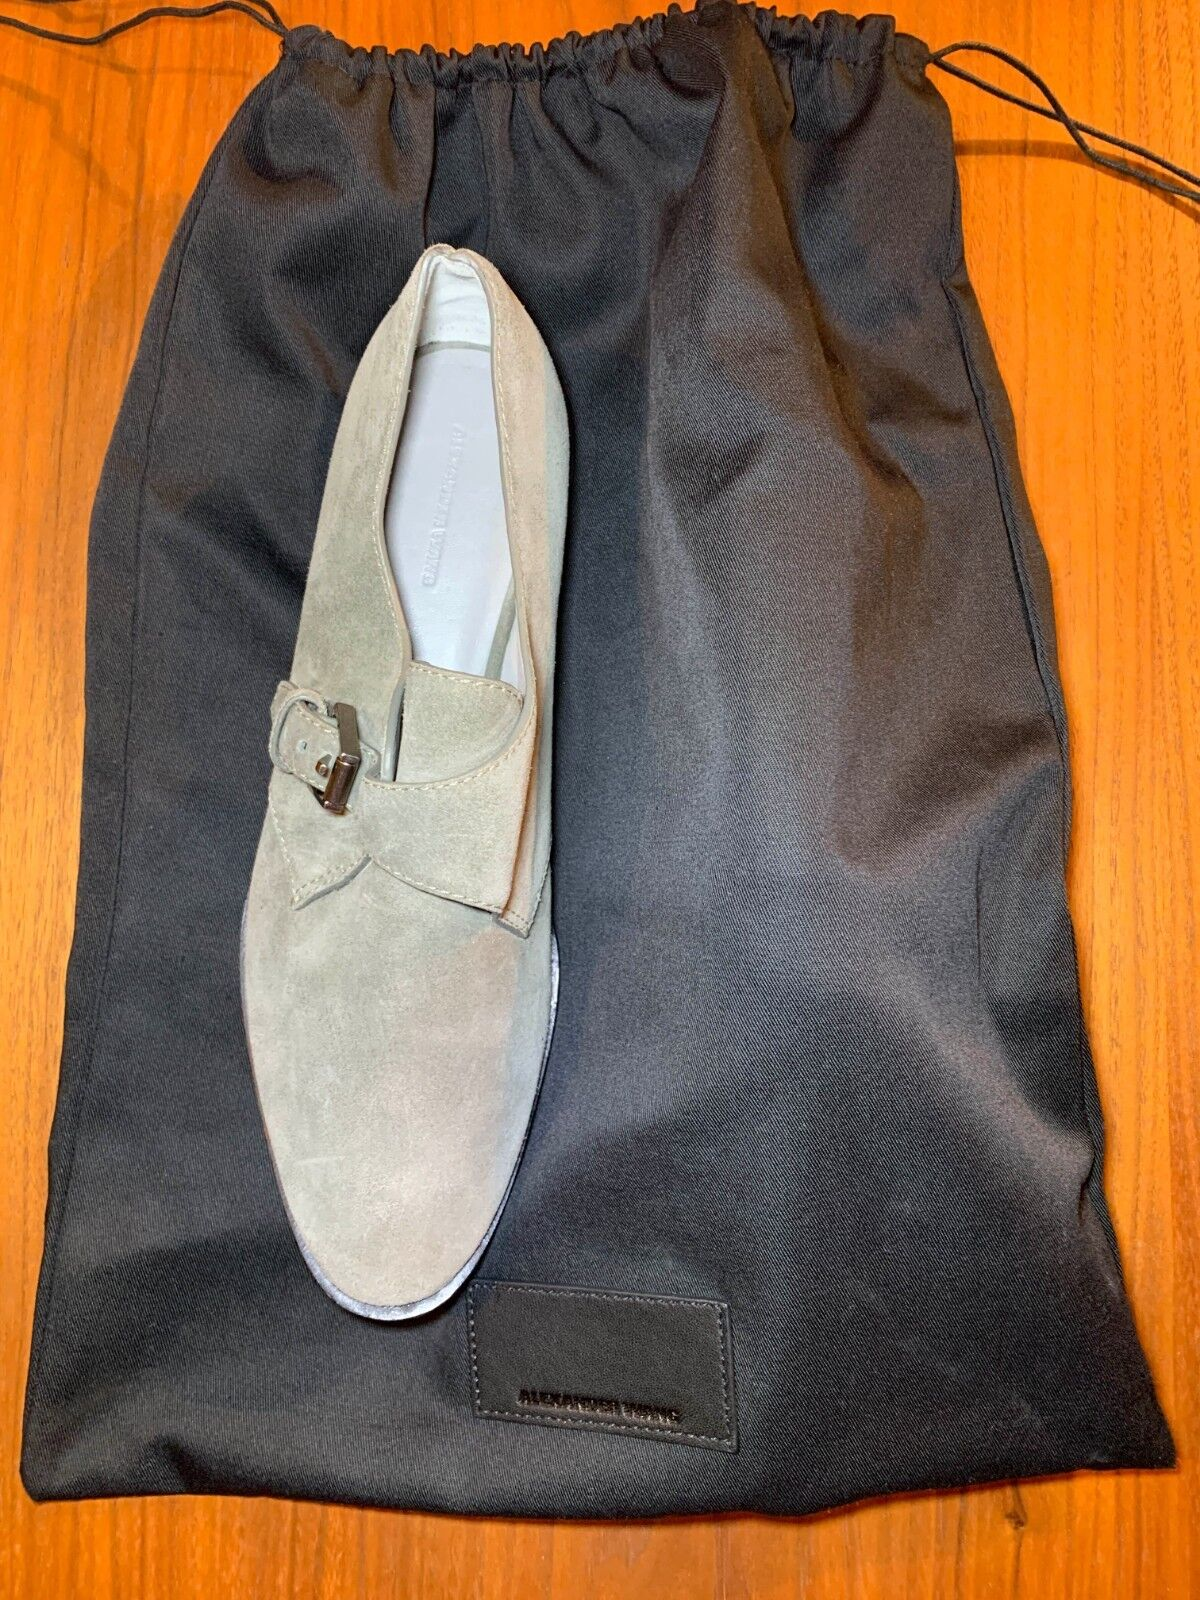 ALEXANDER WANG Monk Strap Oxfords shoes Suede Grey Size Size Size US 11 EU 41 063320